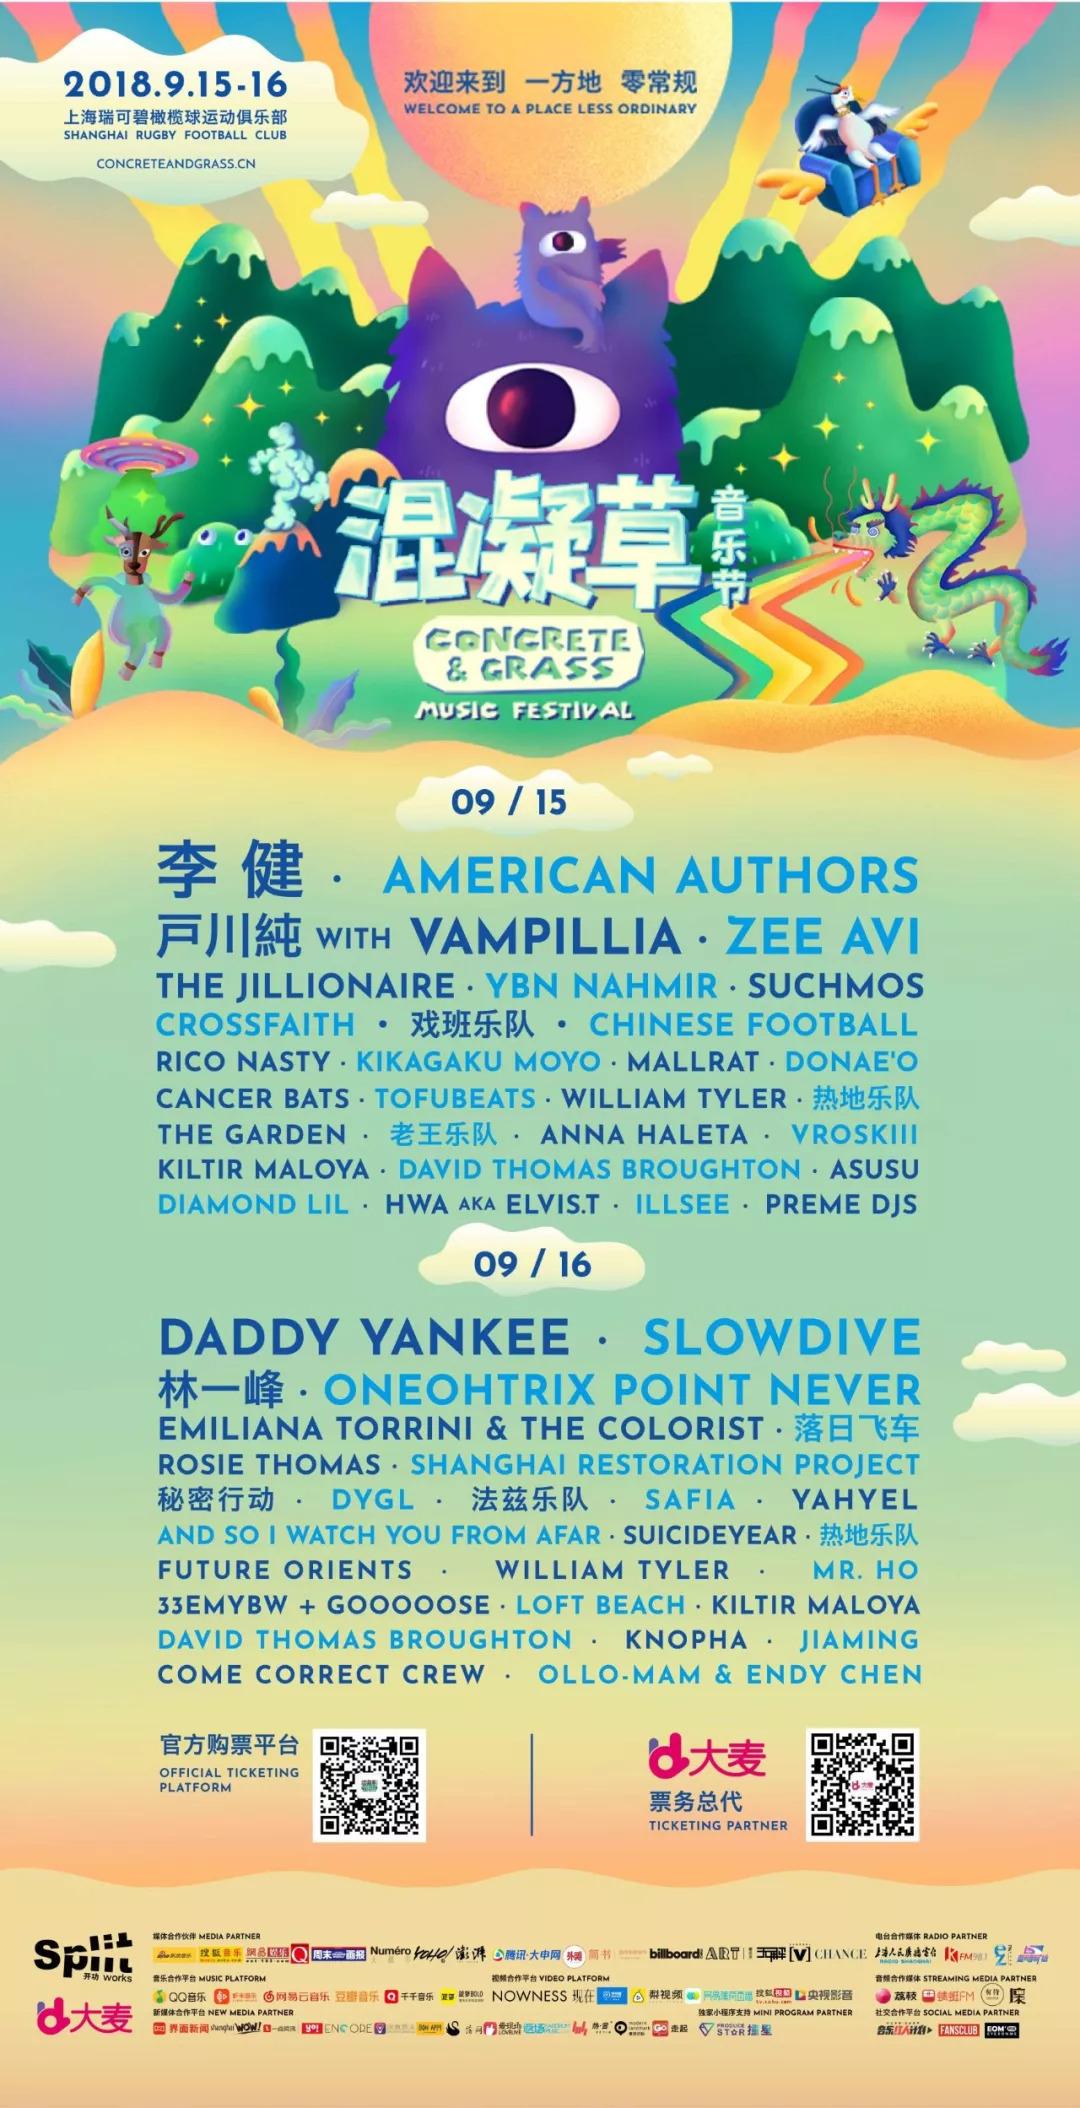 15th-16th   混凝草音乐节 comcrete&grass music festival 2018